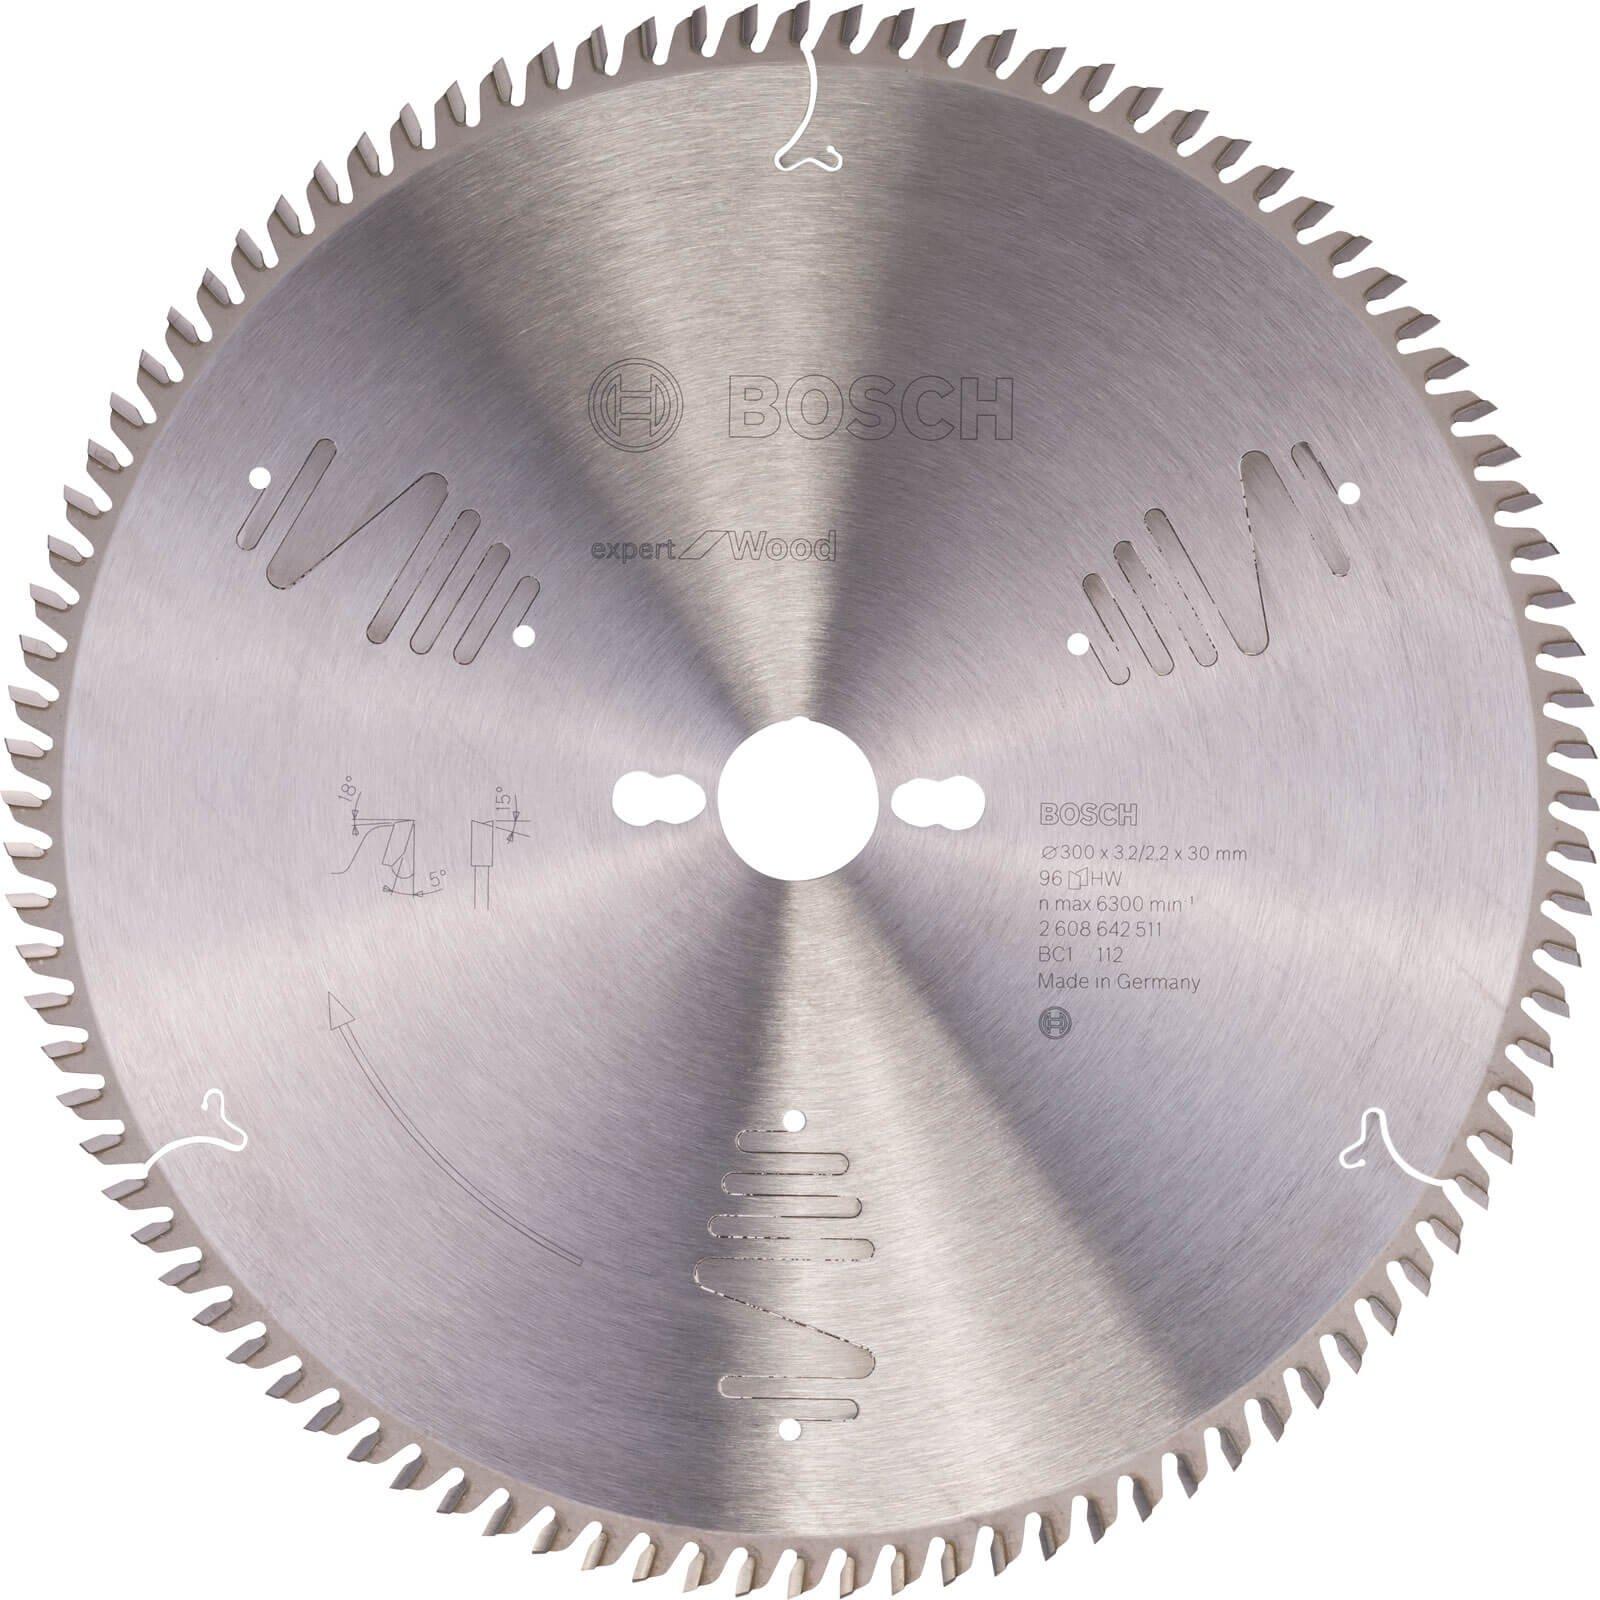 Bosch CSB Expert for Wood Circular Saw Blade 300mm 96T 30mm